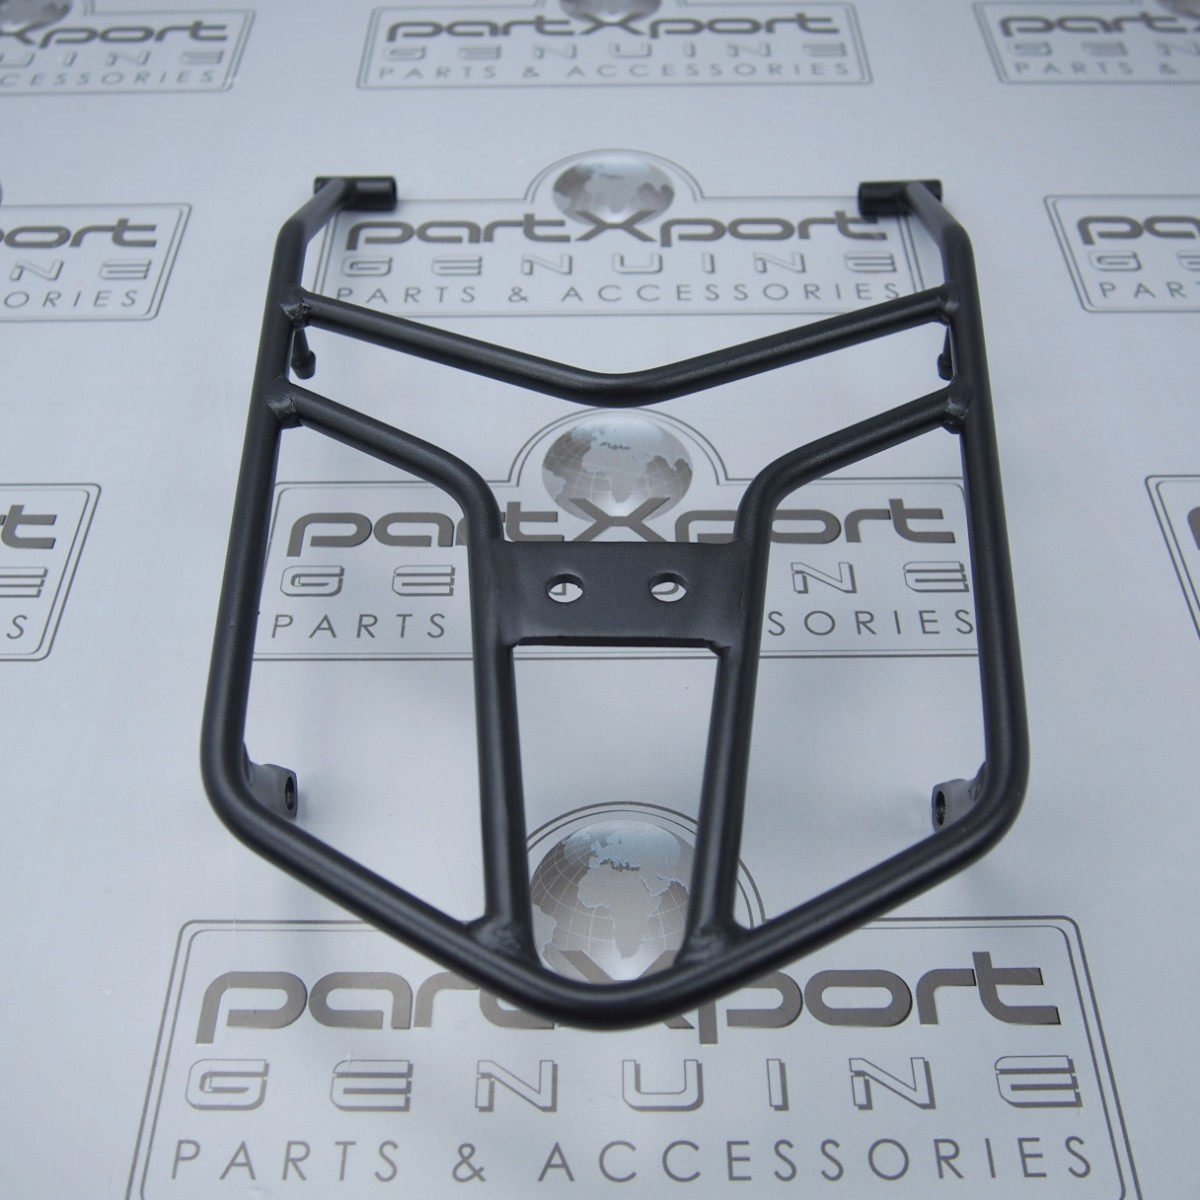 2012 Honda Crf250l Specs Released: CRF250L 2012